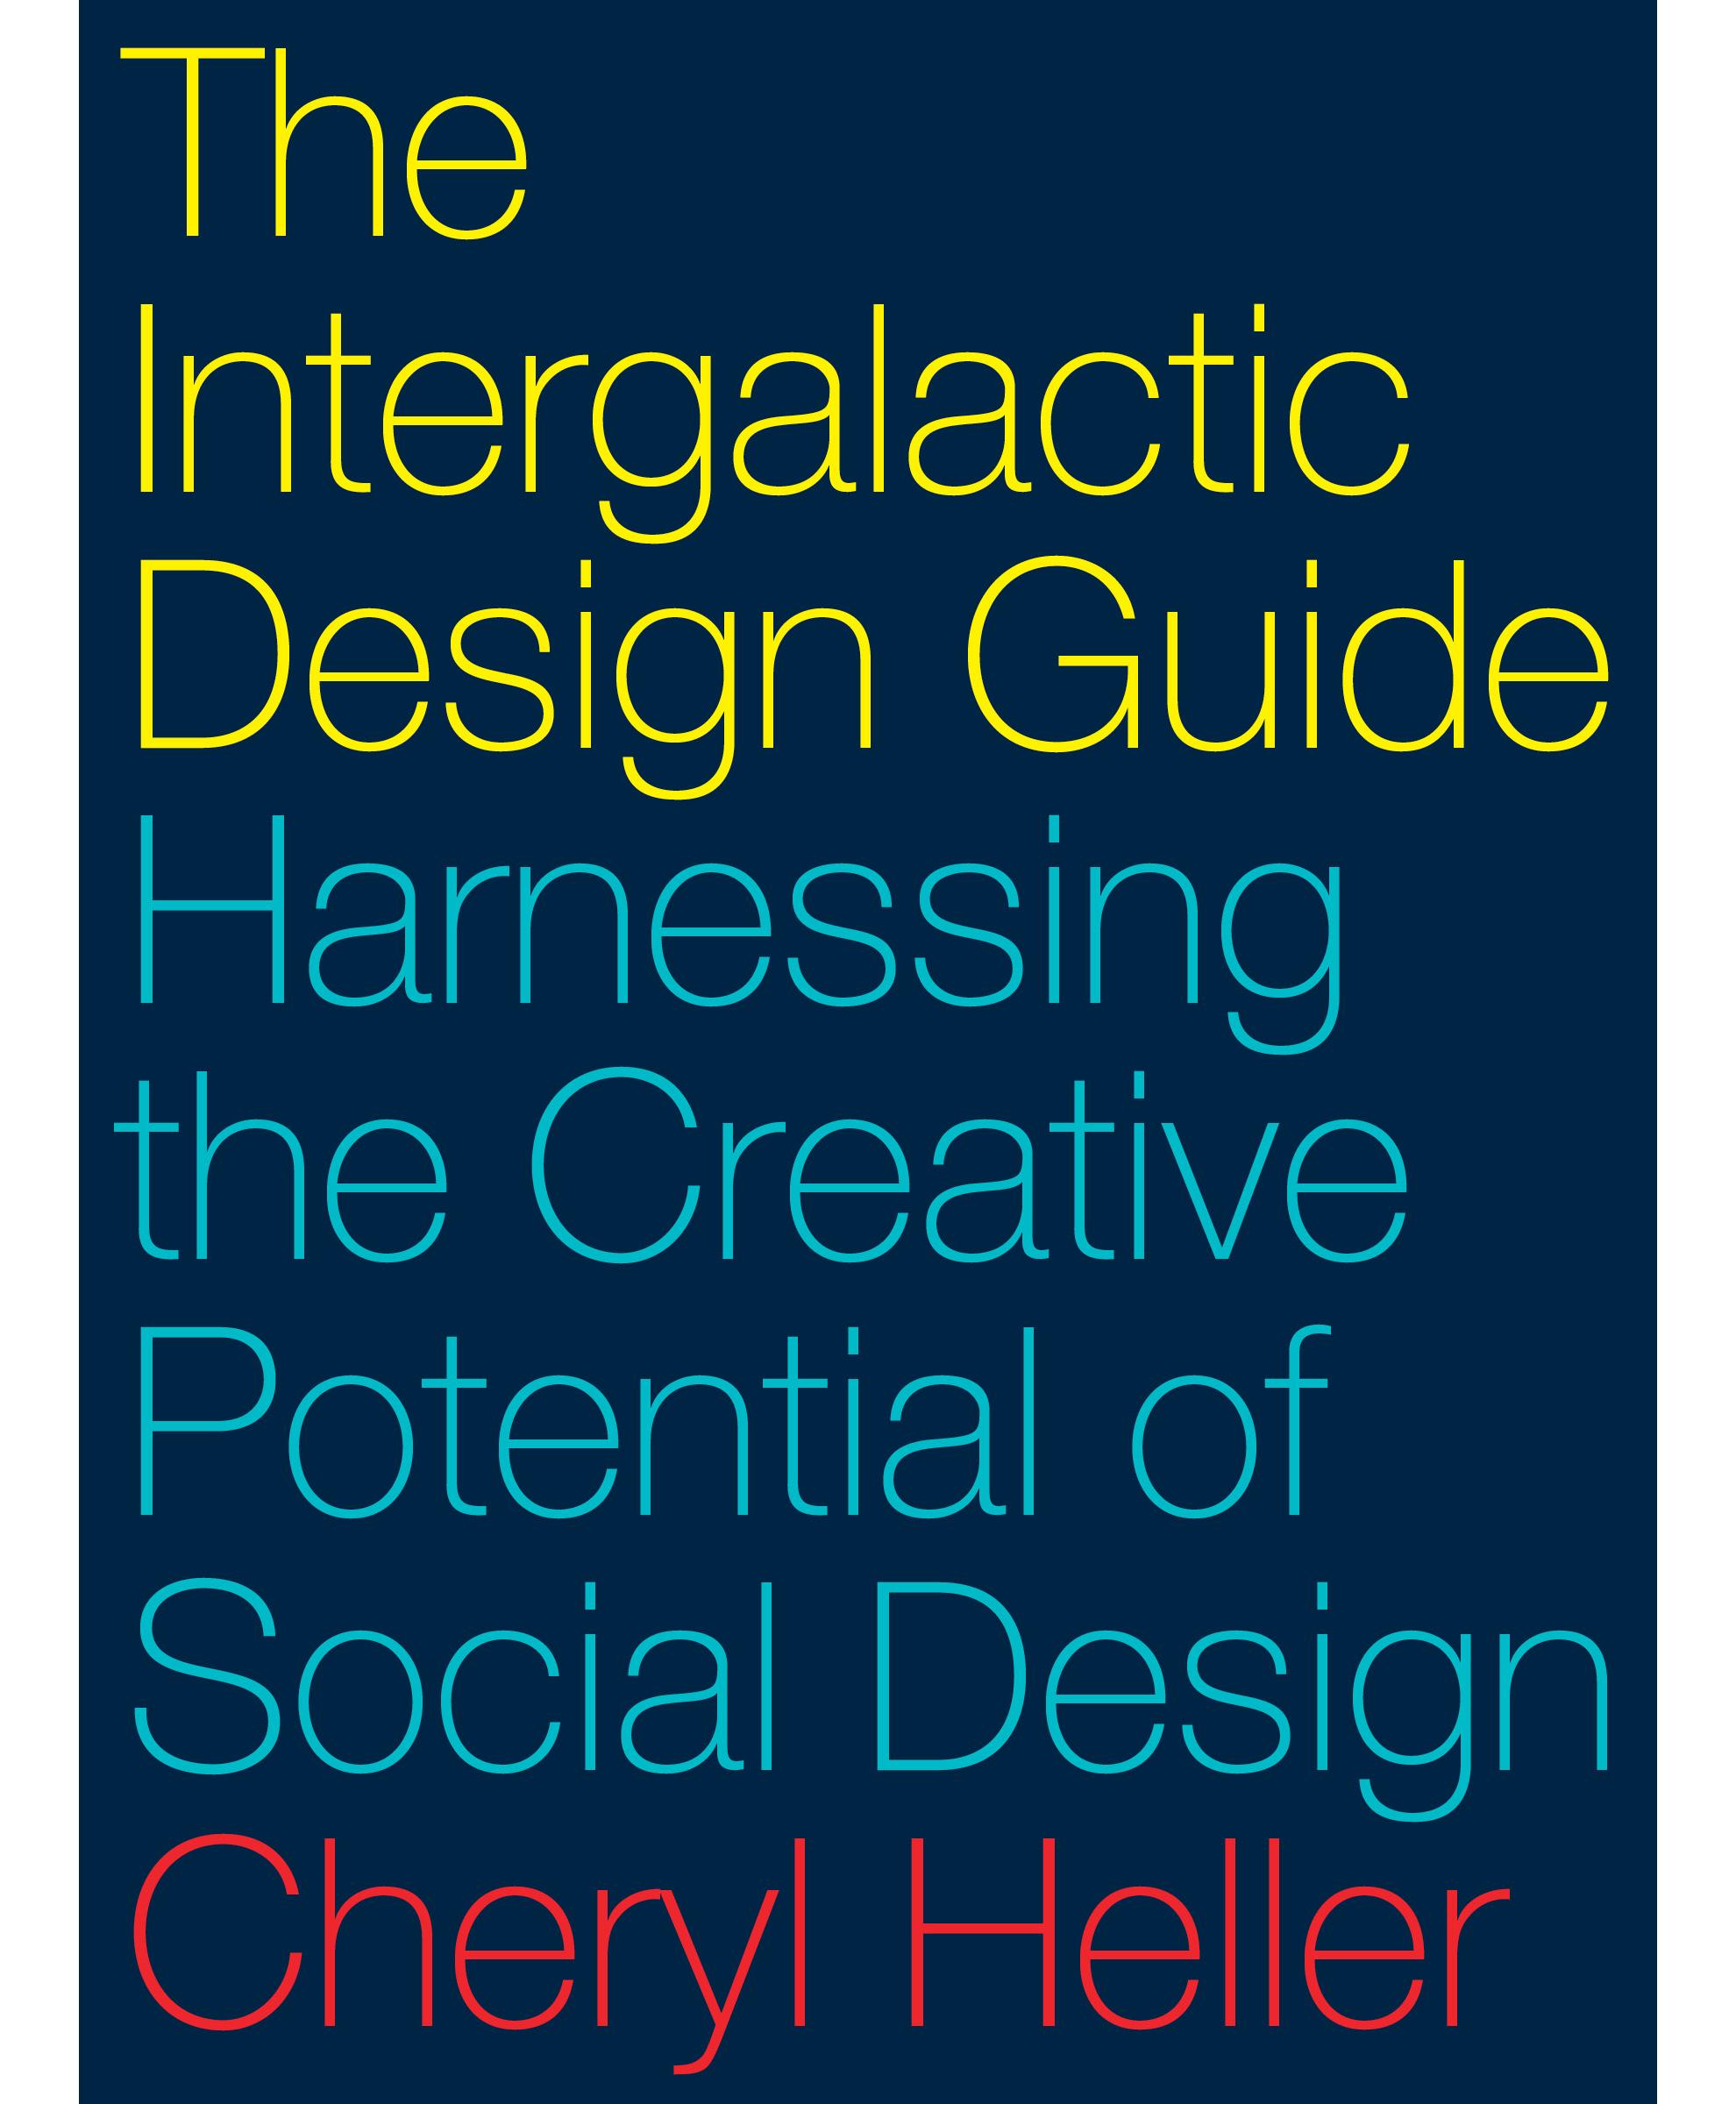 9781610918817_Heller_The Intergalactic Design Guide copy copy.png